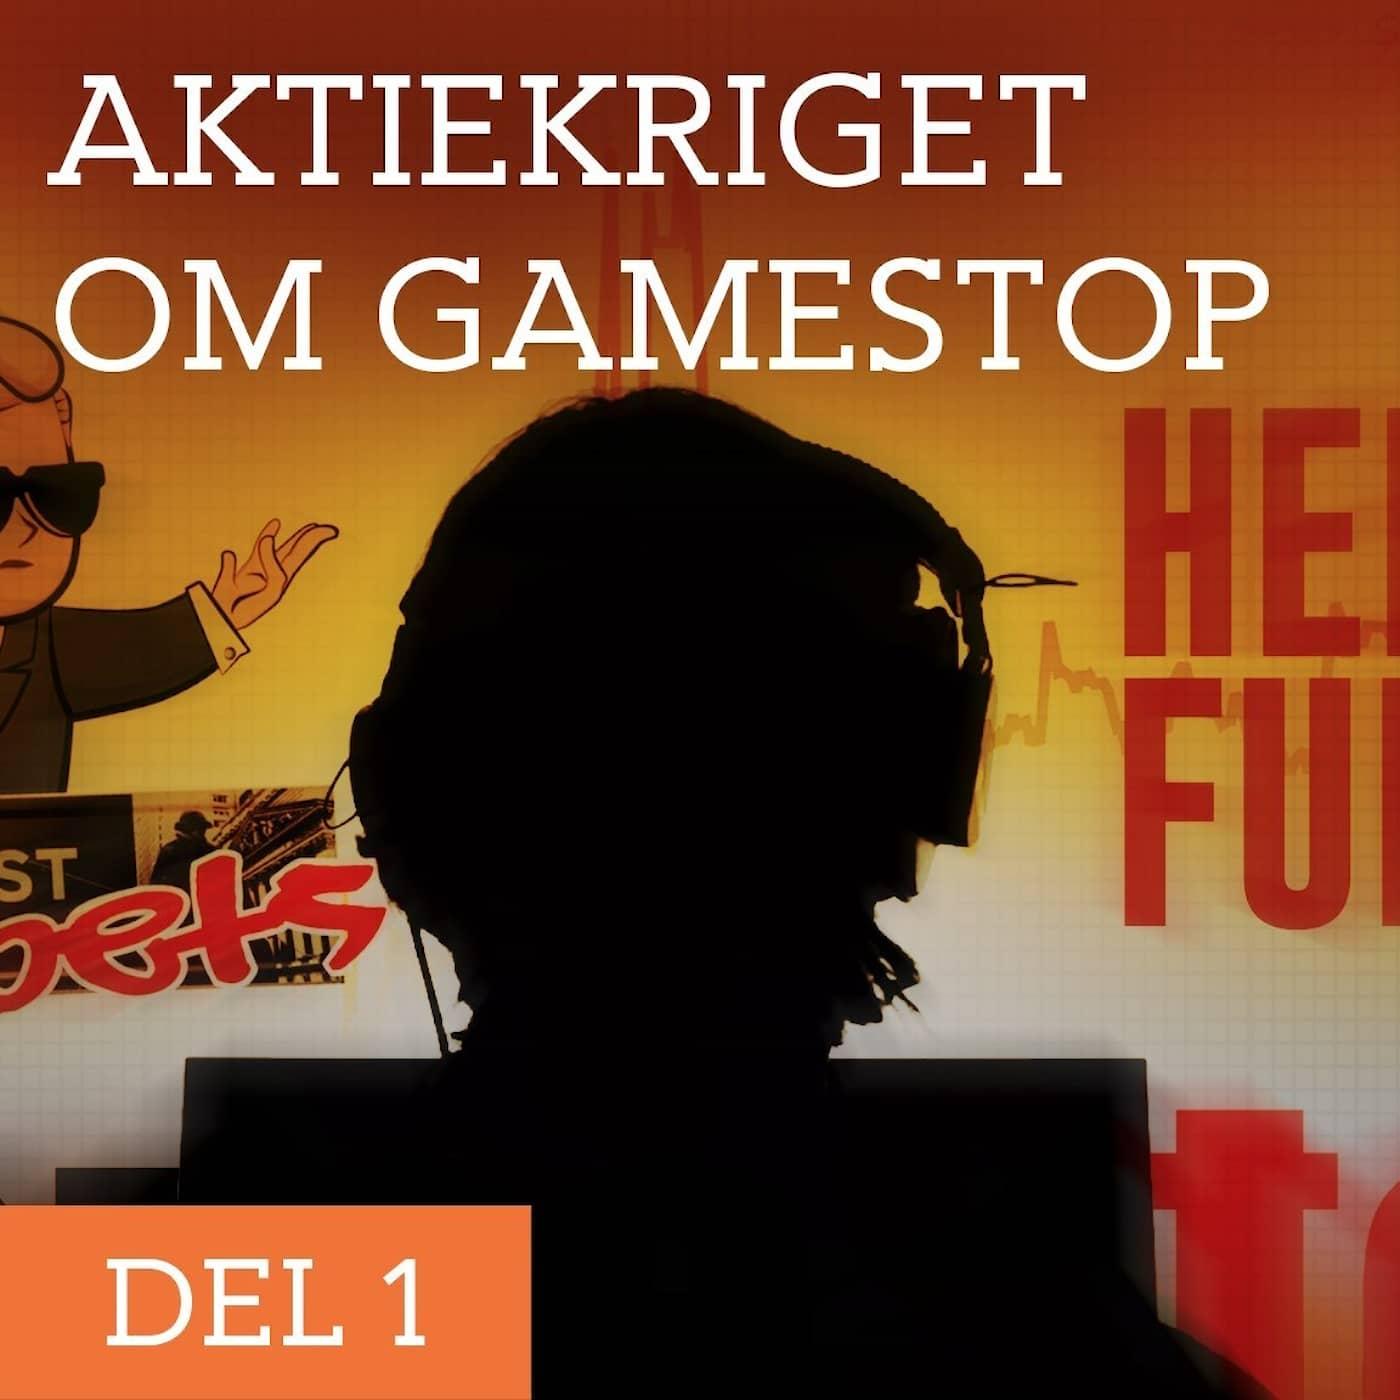 Aktiekriget om Gamestop - Stora cash